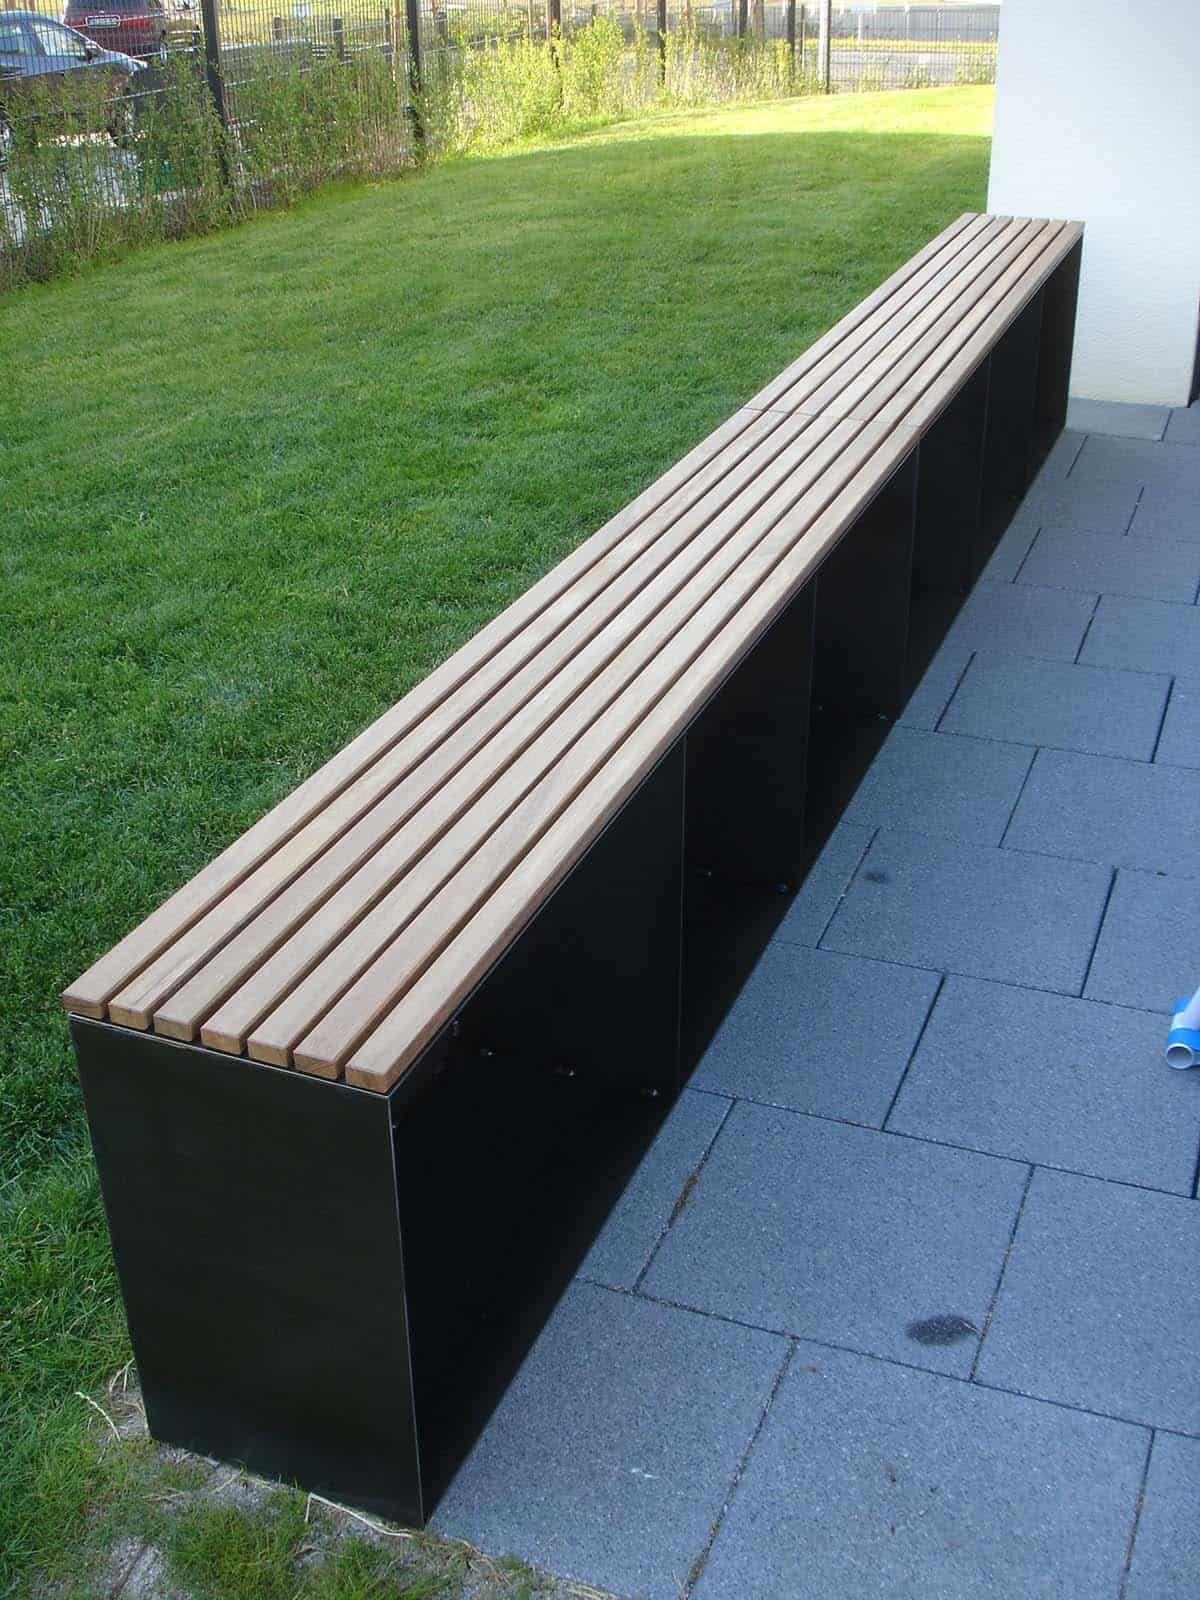 Gartenbank Aus Holz Und Metall Online Kaufen Stahlzart Gartenbank Holz Kamin Holz Aufbewahrung Sitzbank Garten